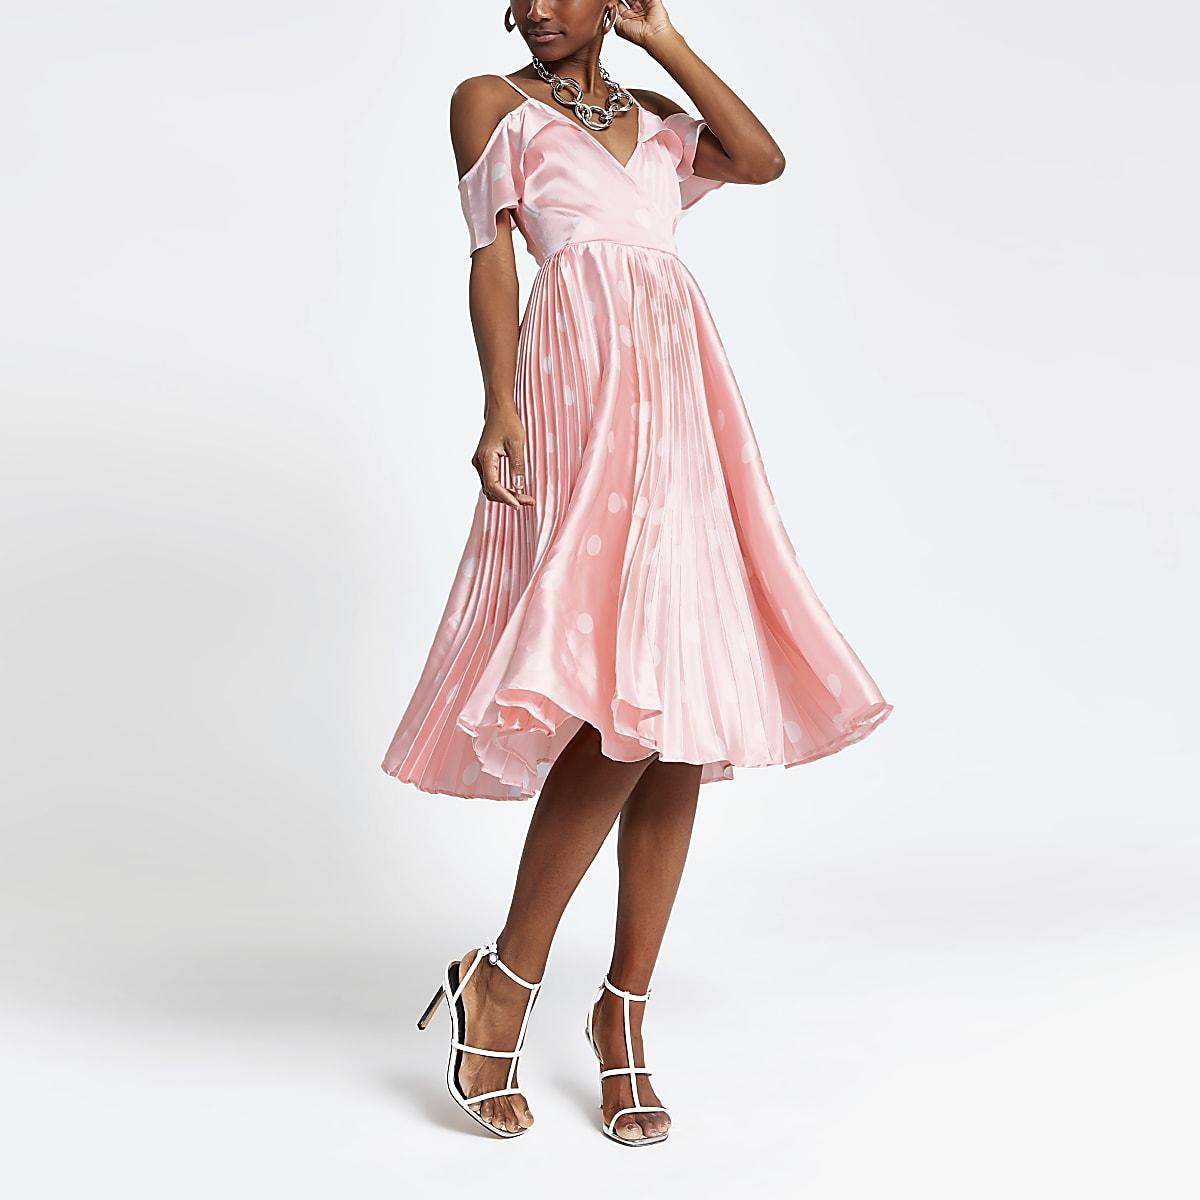 e29cc3ec00f7 Pink spot cold shoulder pleated swing dress - Swing Dresses ...